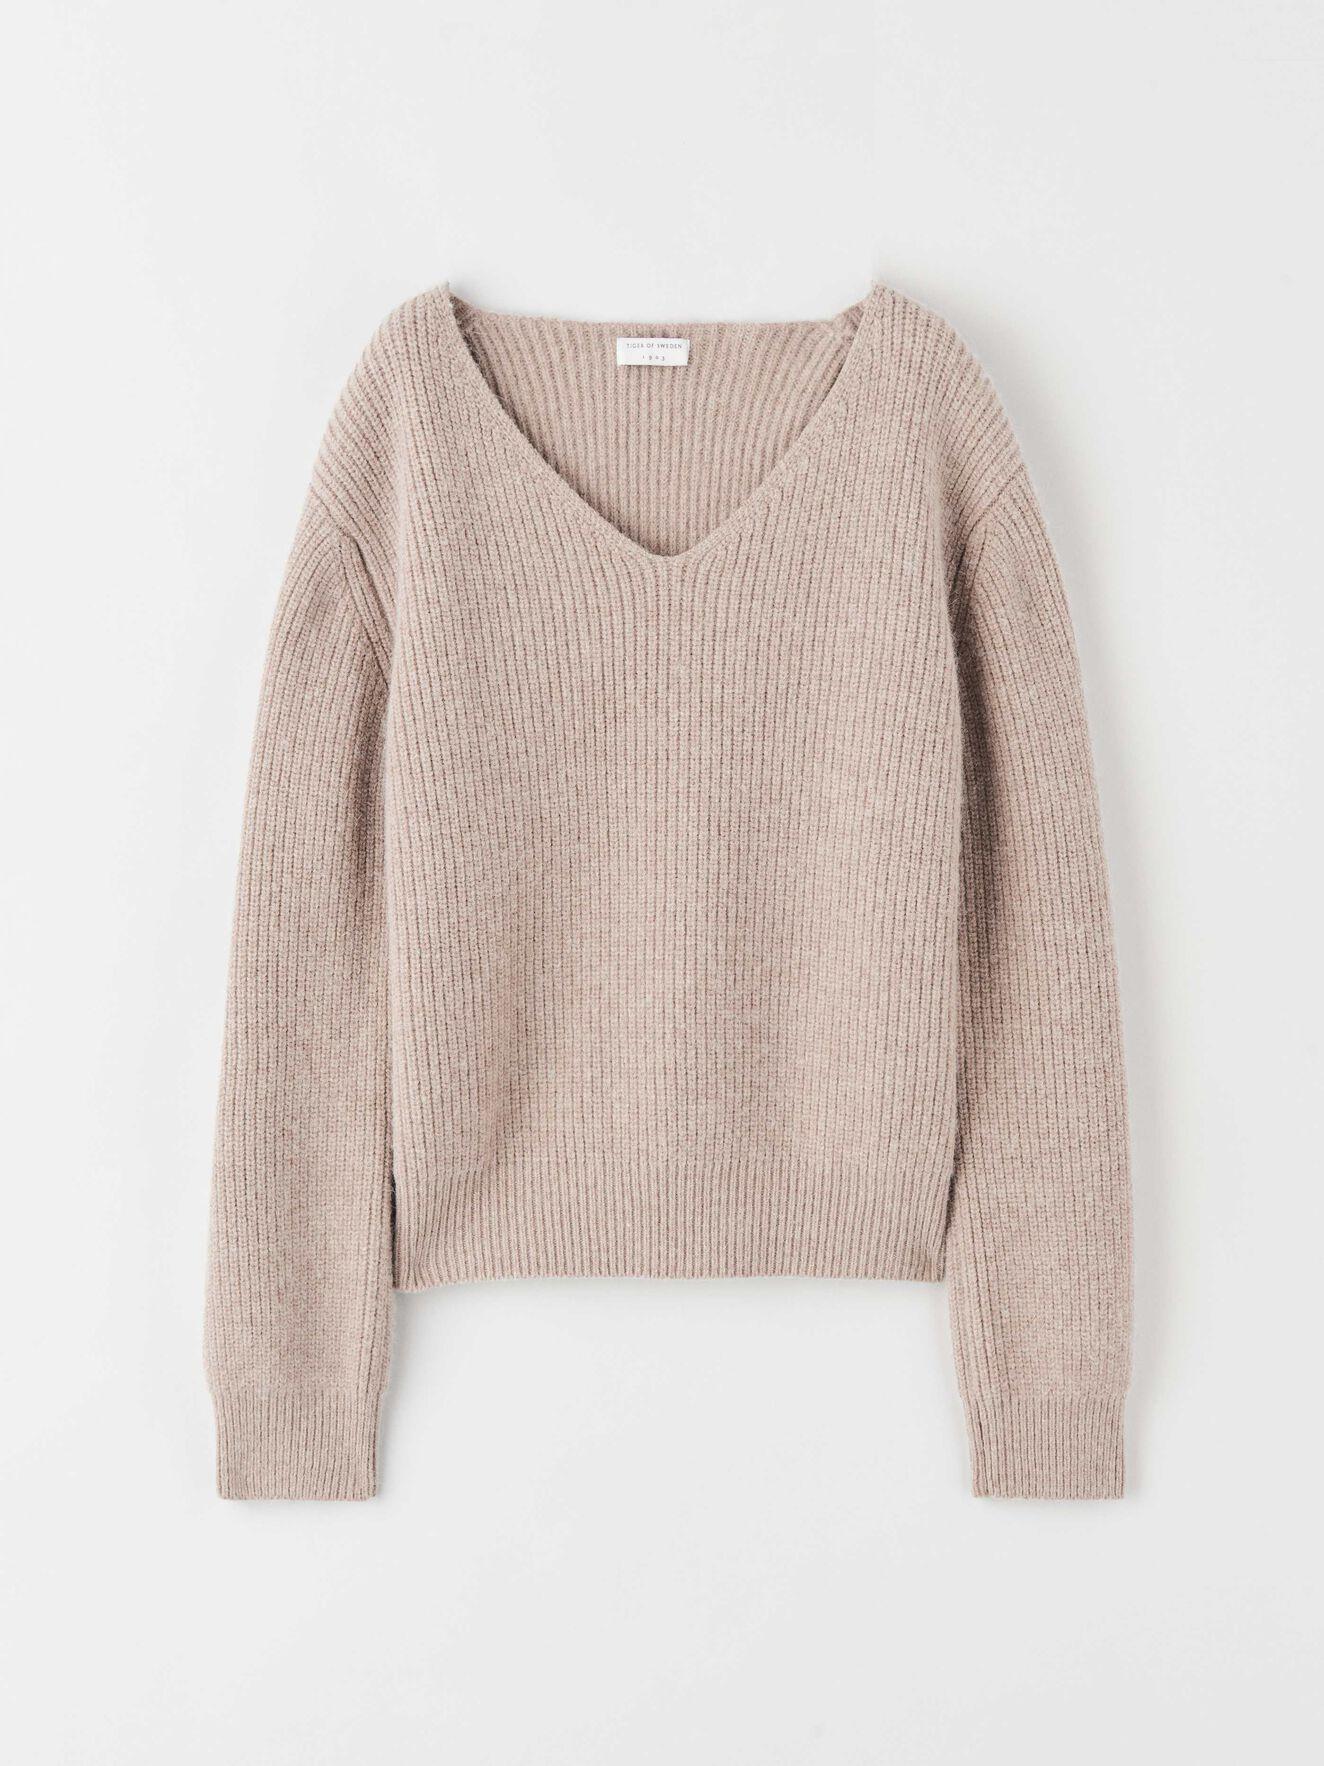 half off 47a3e 2cc56 Listers Pullover - Köp Knitwear online